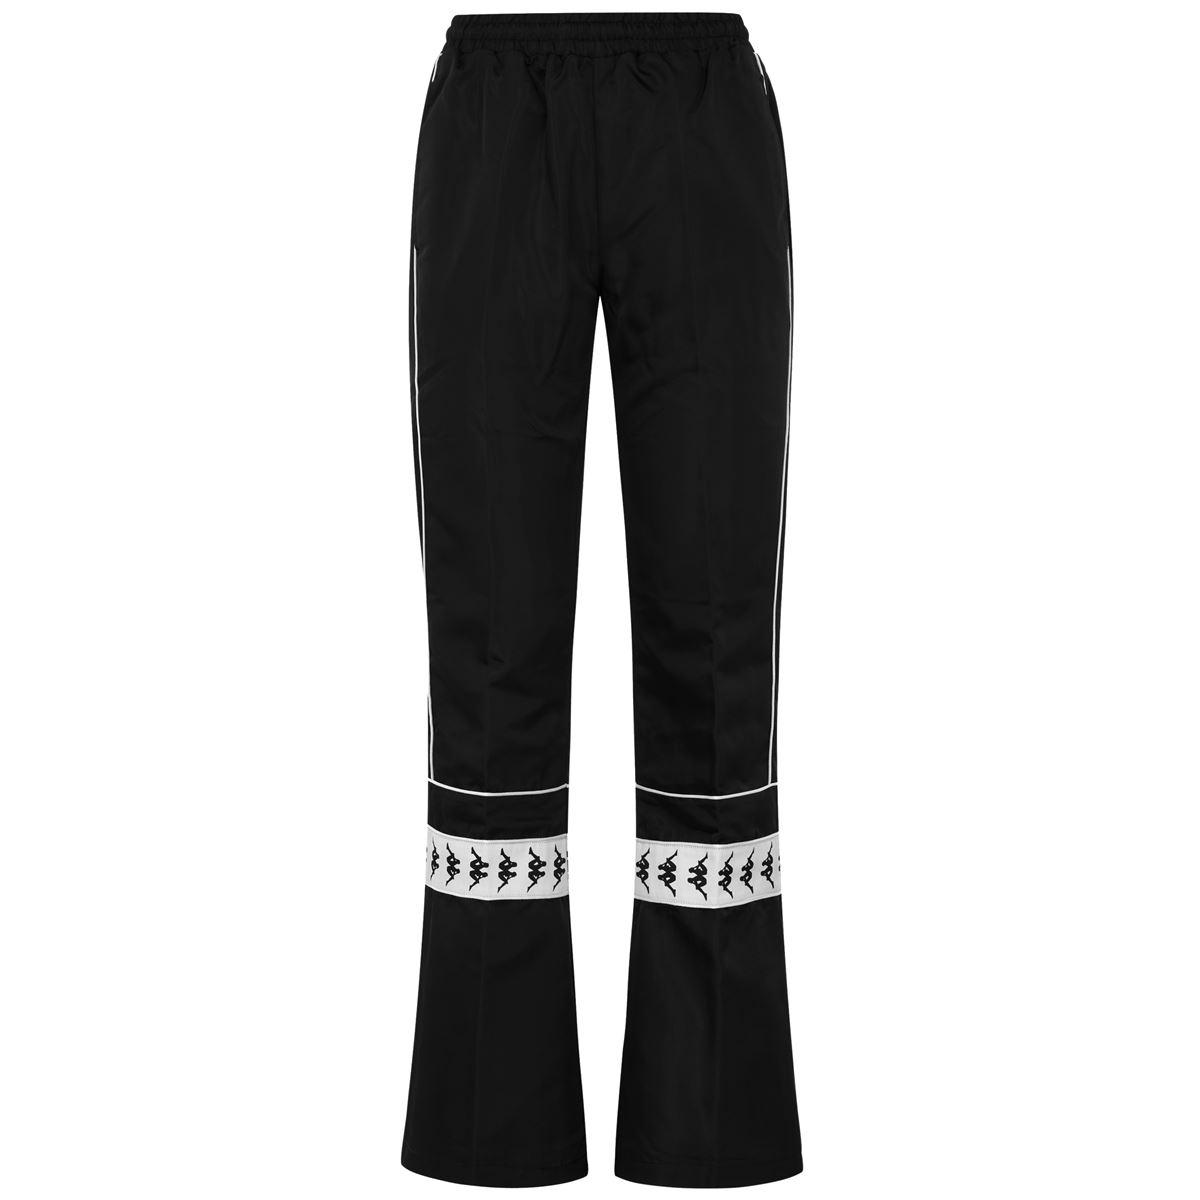 Kappa Pantaloni donna-31118EW